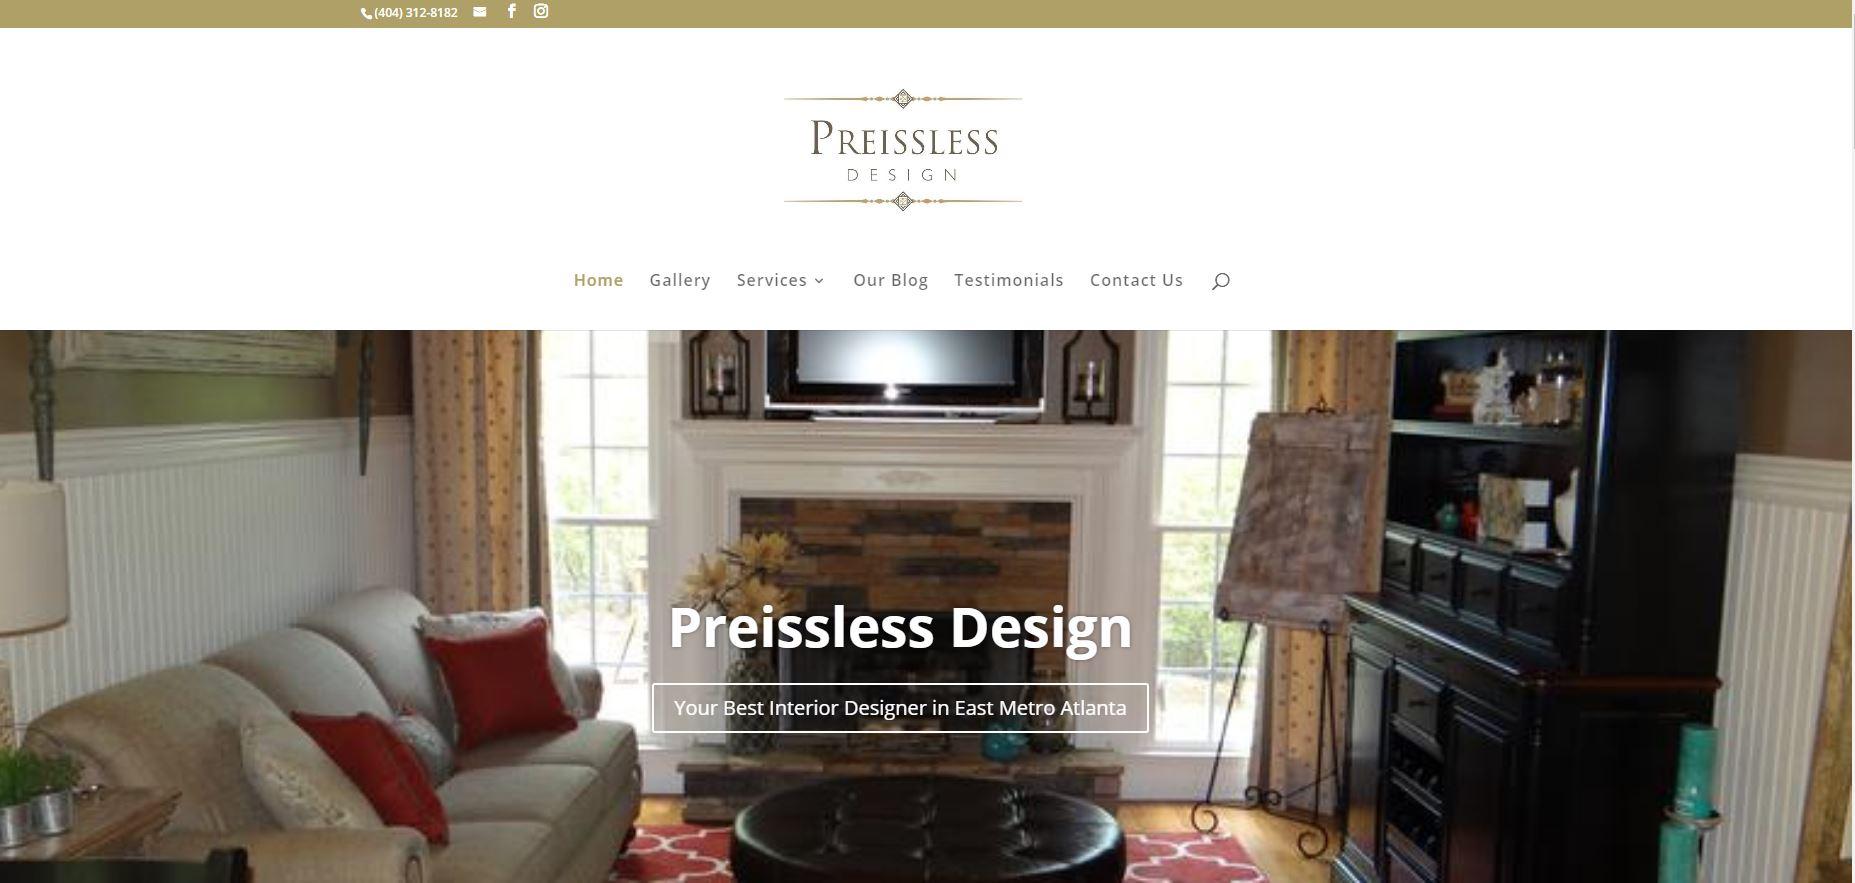 Solia Media Designs New Website for Preissless Design